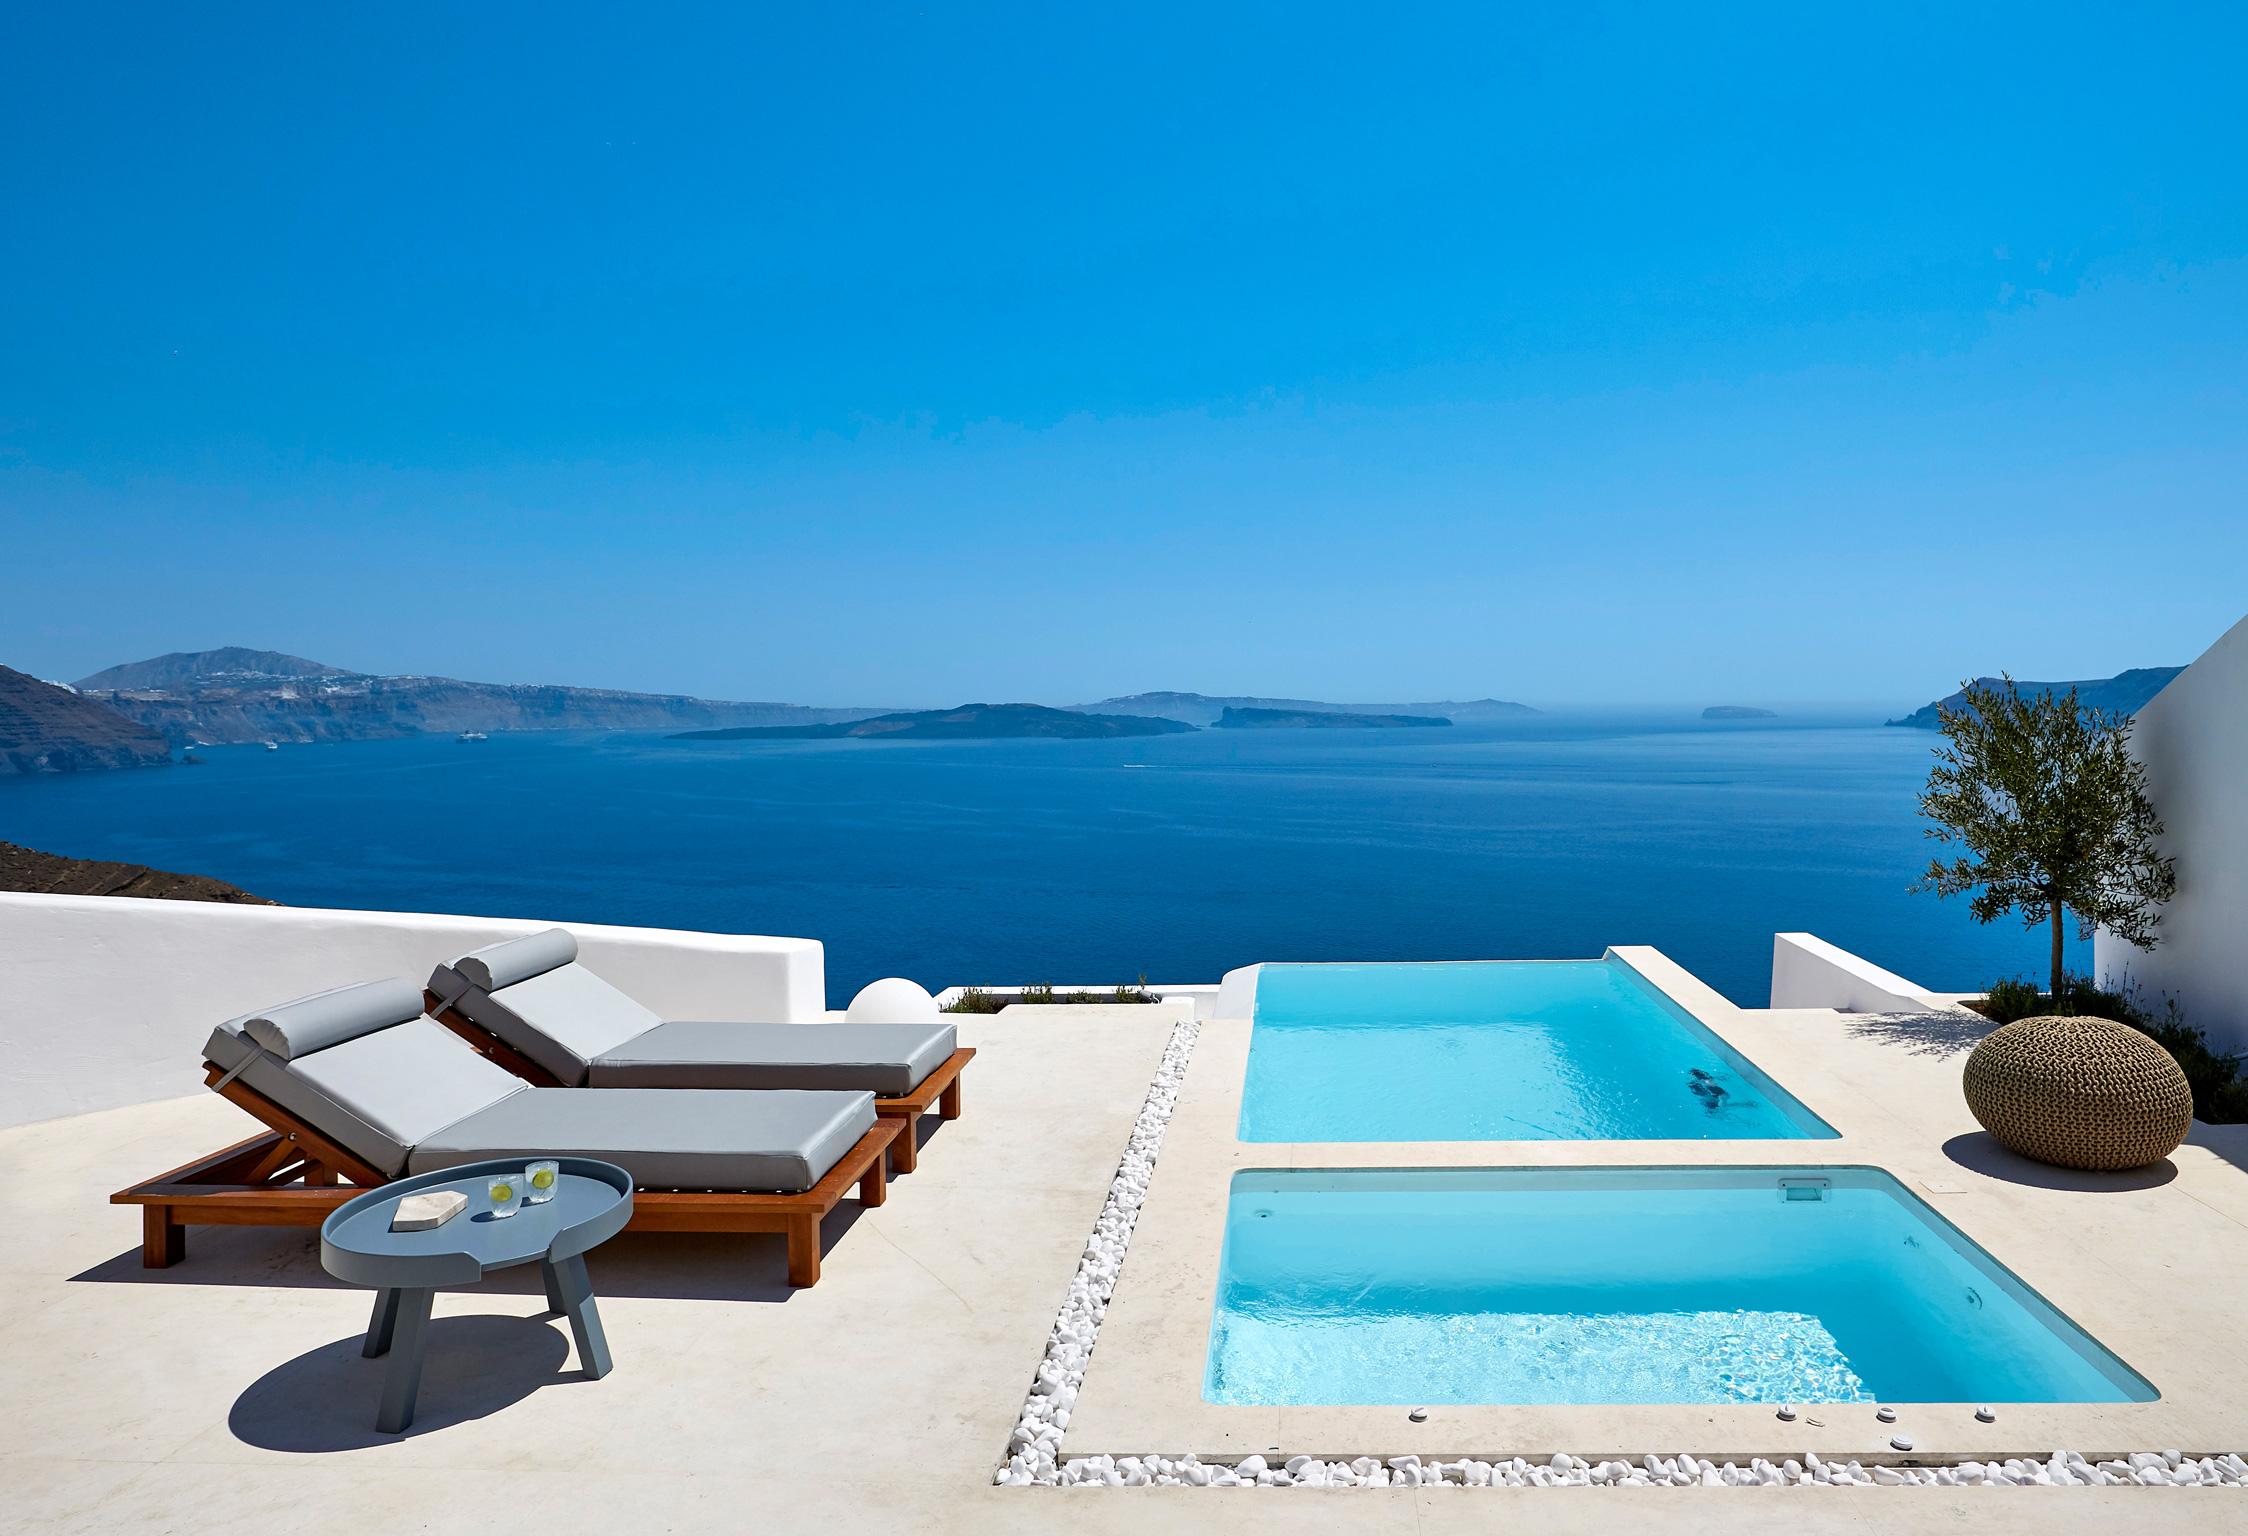 Santorini Villa Aoide 7 jumbotron image